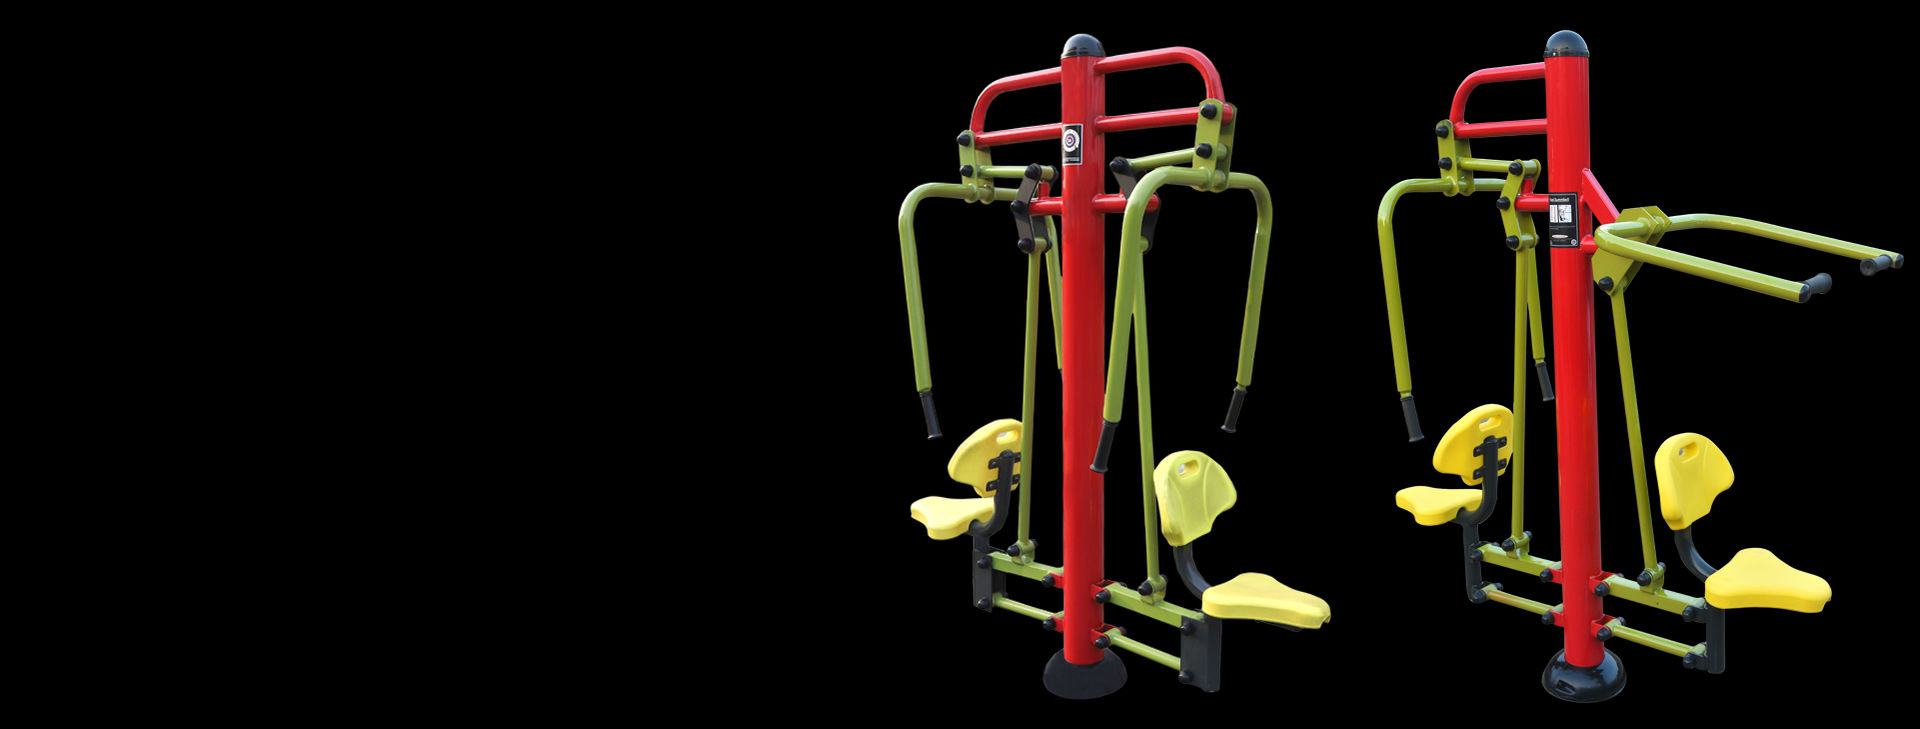 Open Gym Equipment in Bhiwani